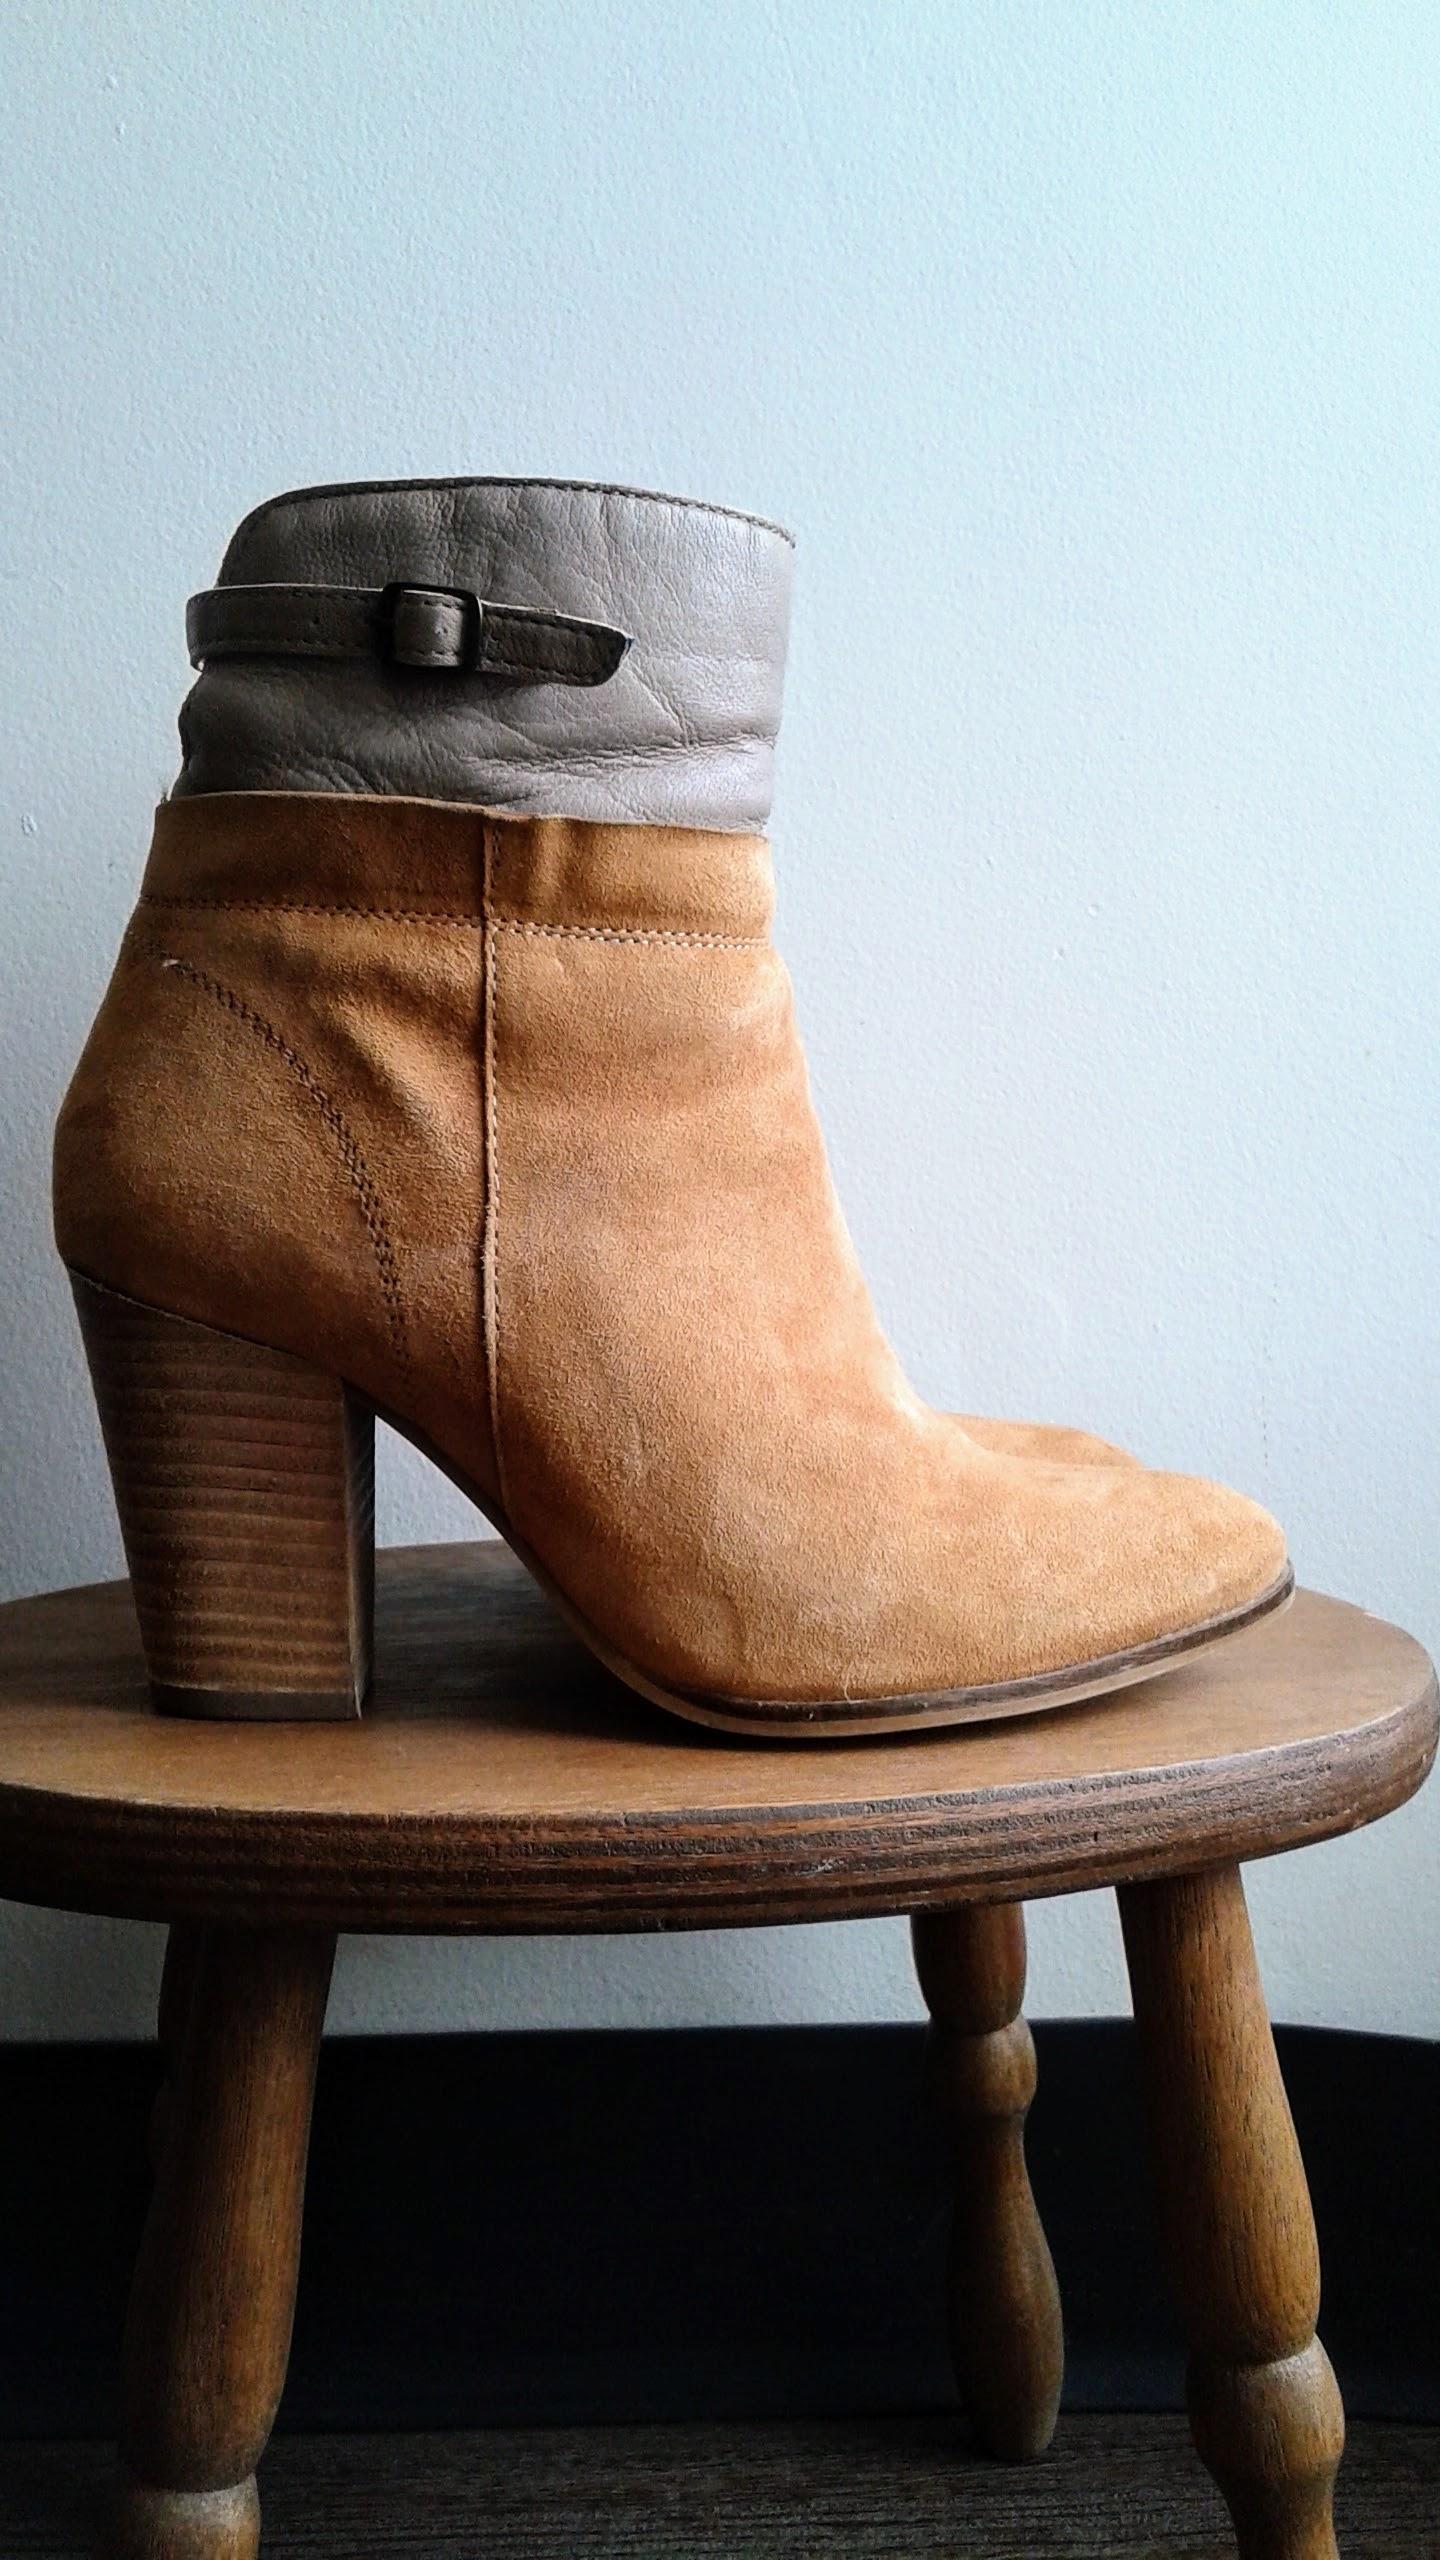 Seychelles boots; S8, $58